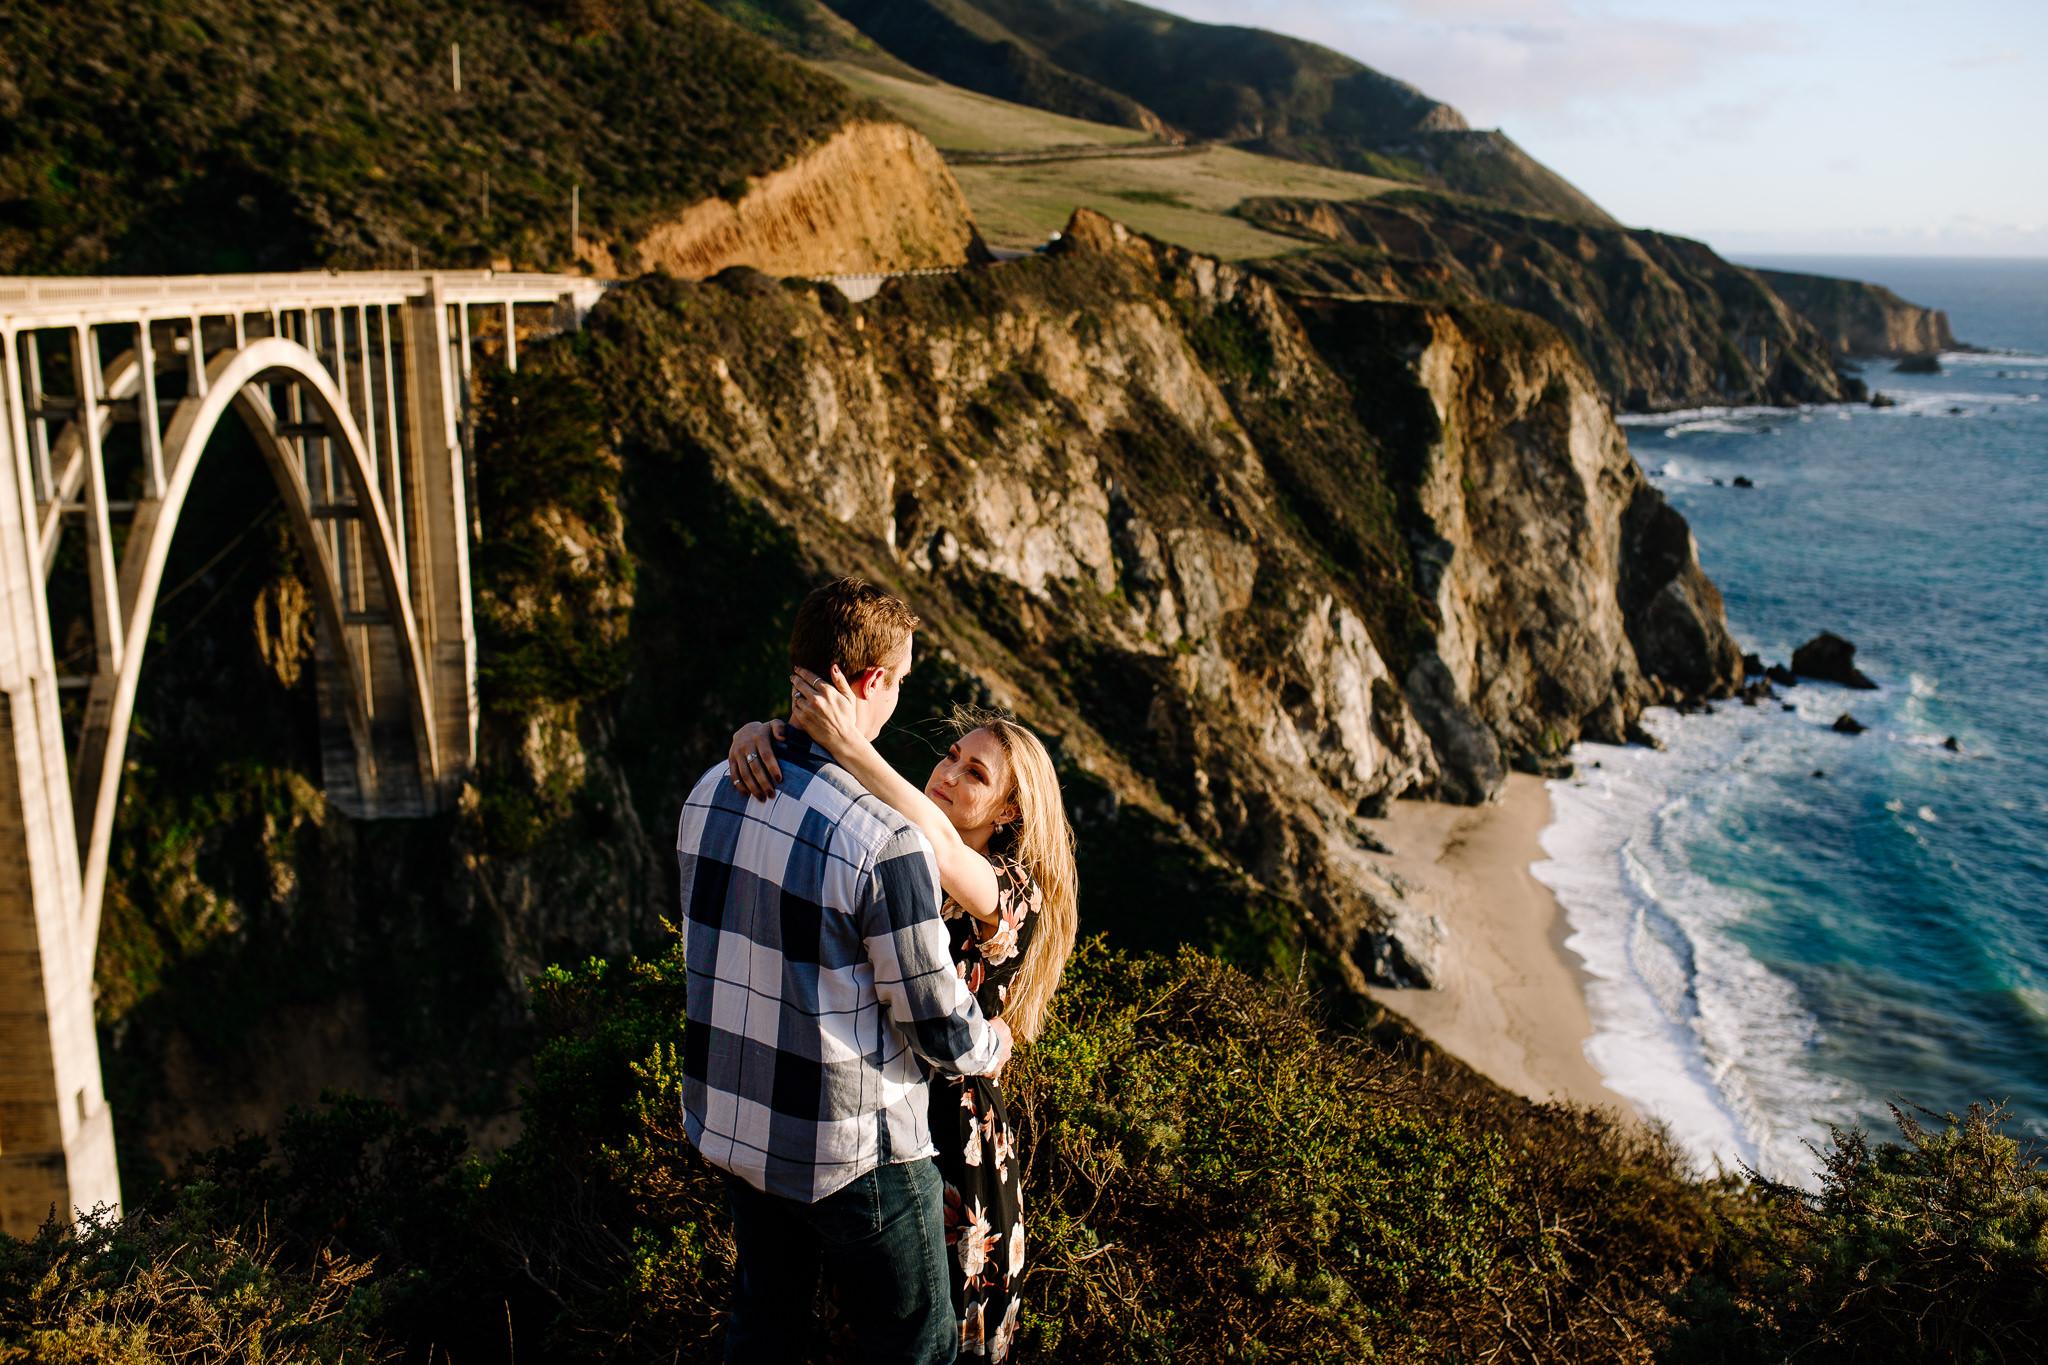 Archer Inspired Photography Michelle JJ Big Sur Wedding Engagement California Central Coast Lifestyle Documentary Photographer-4.jpg